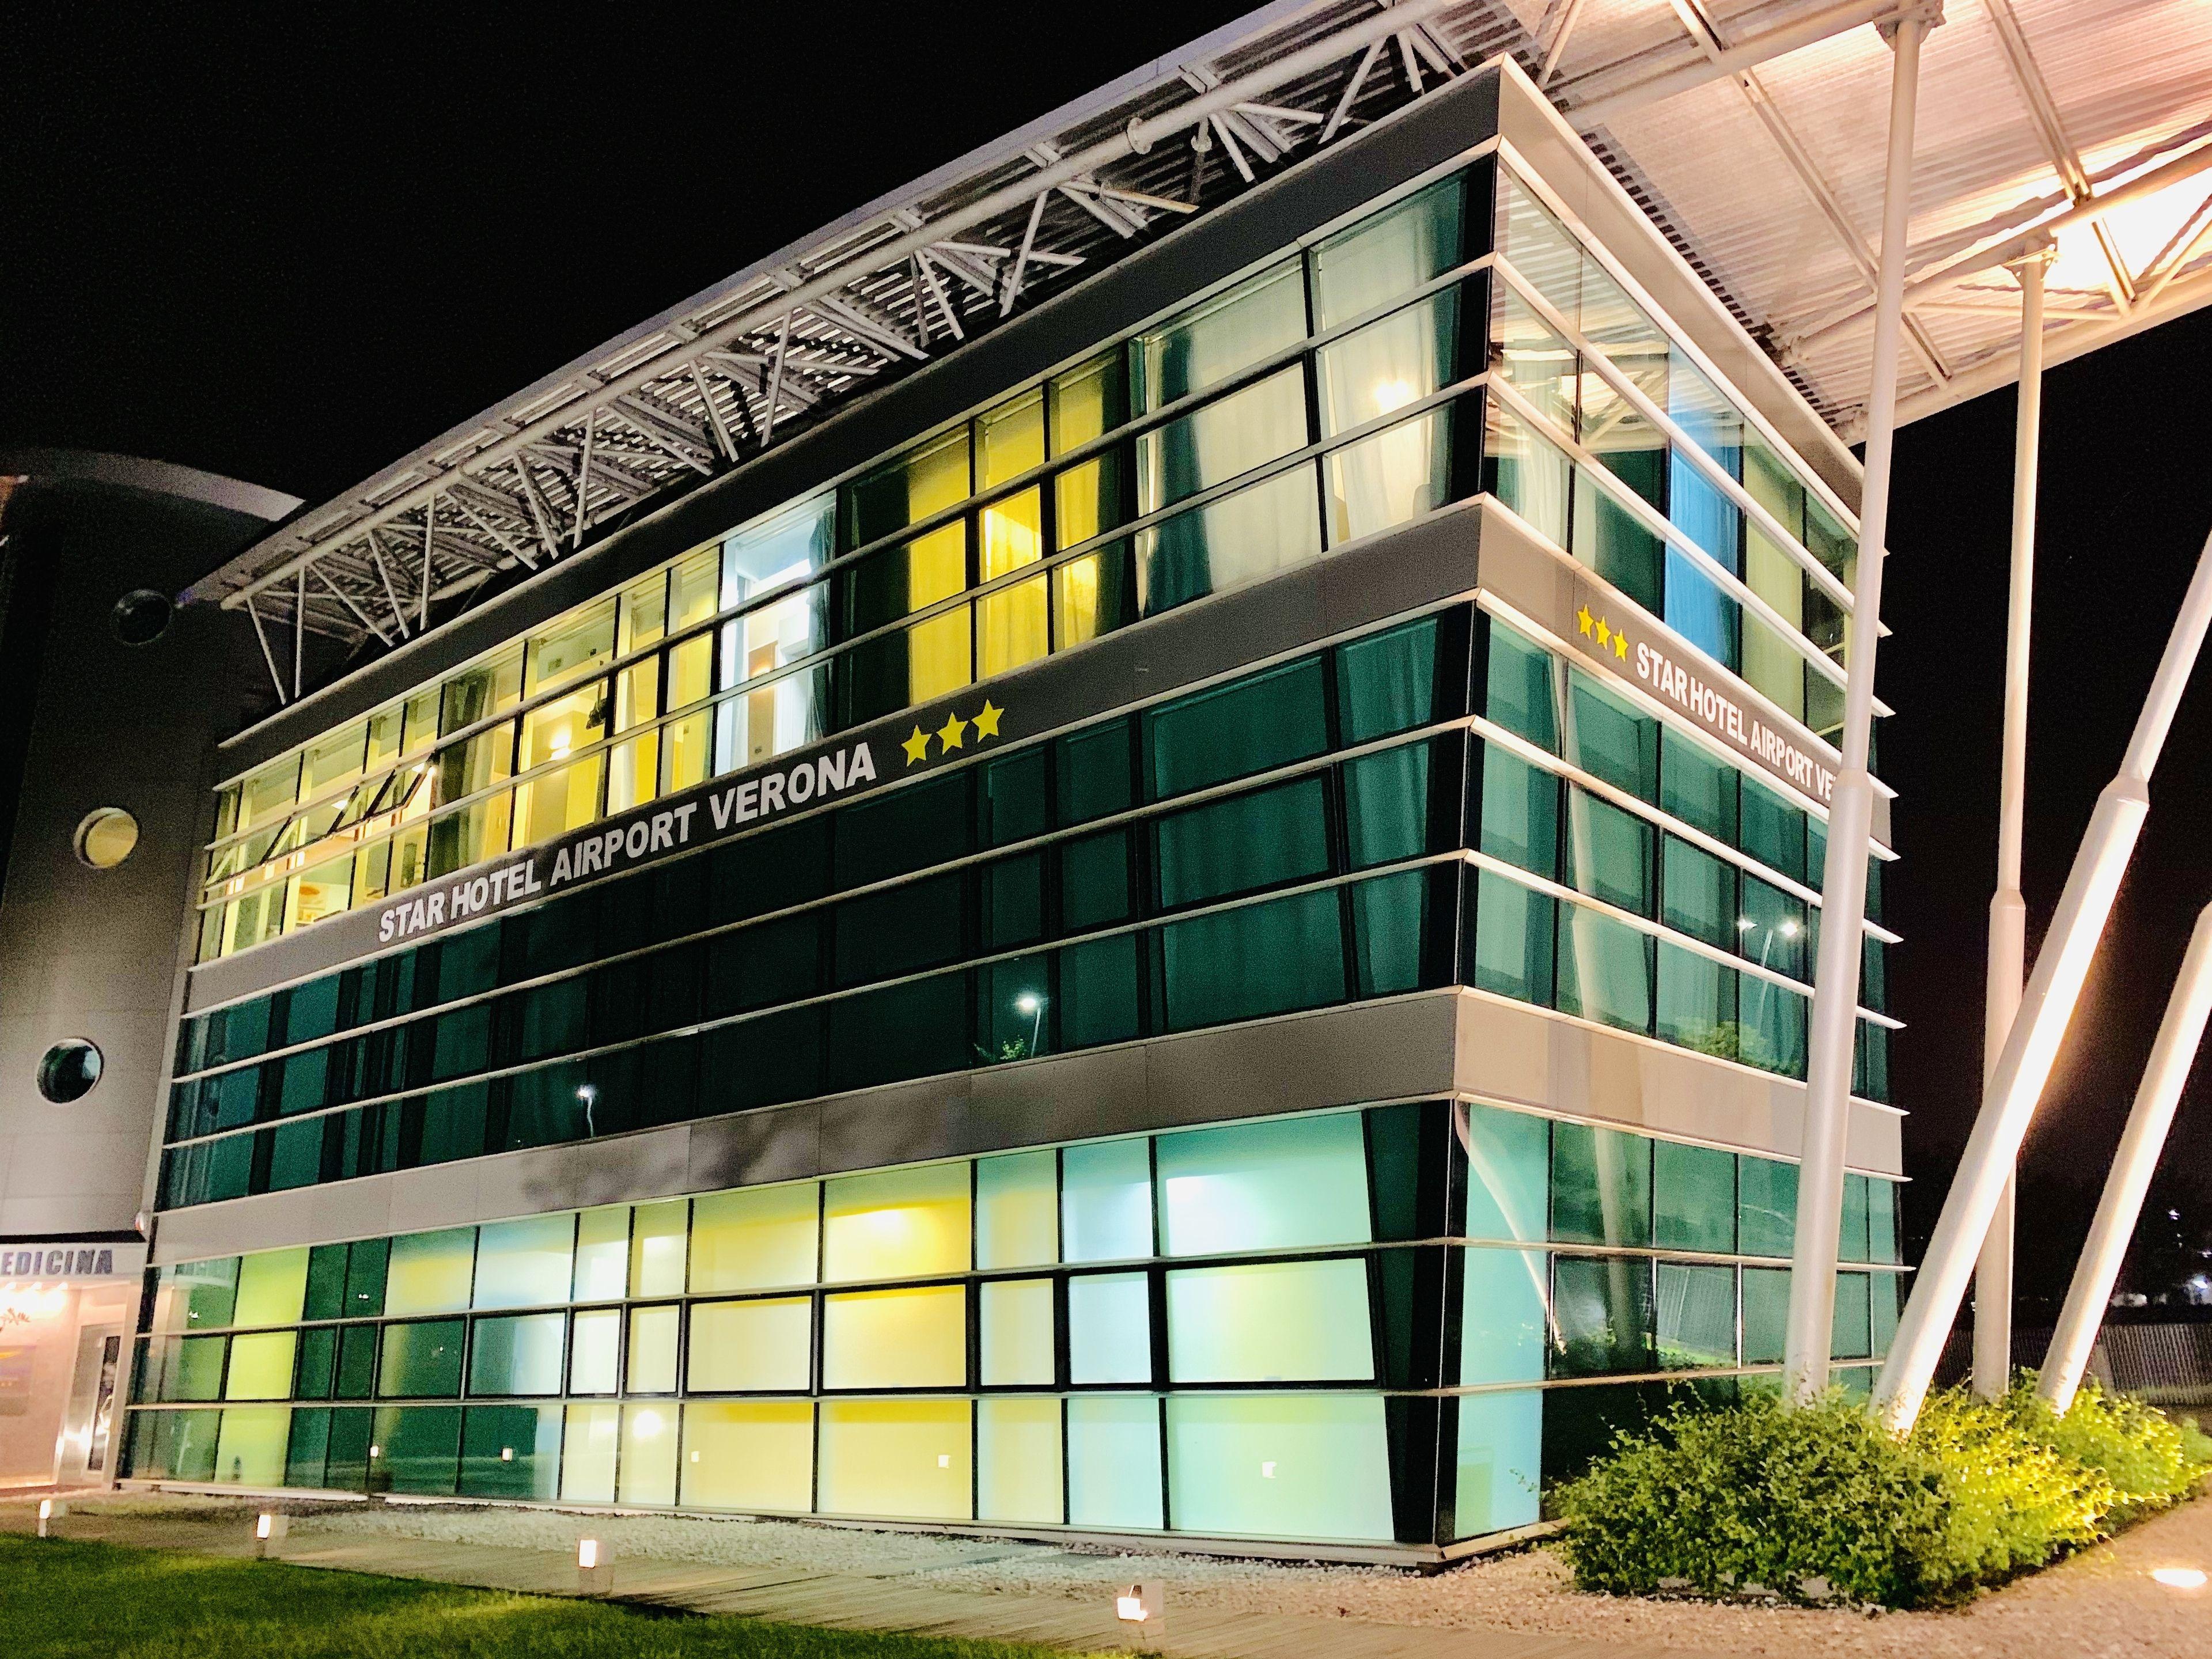 Star Airport Verona